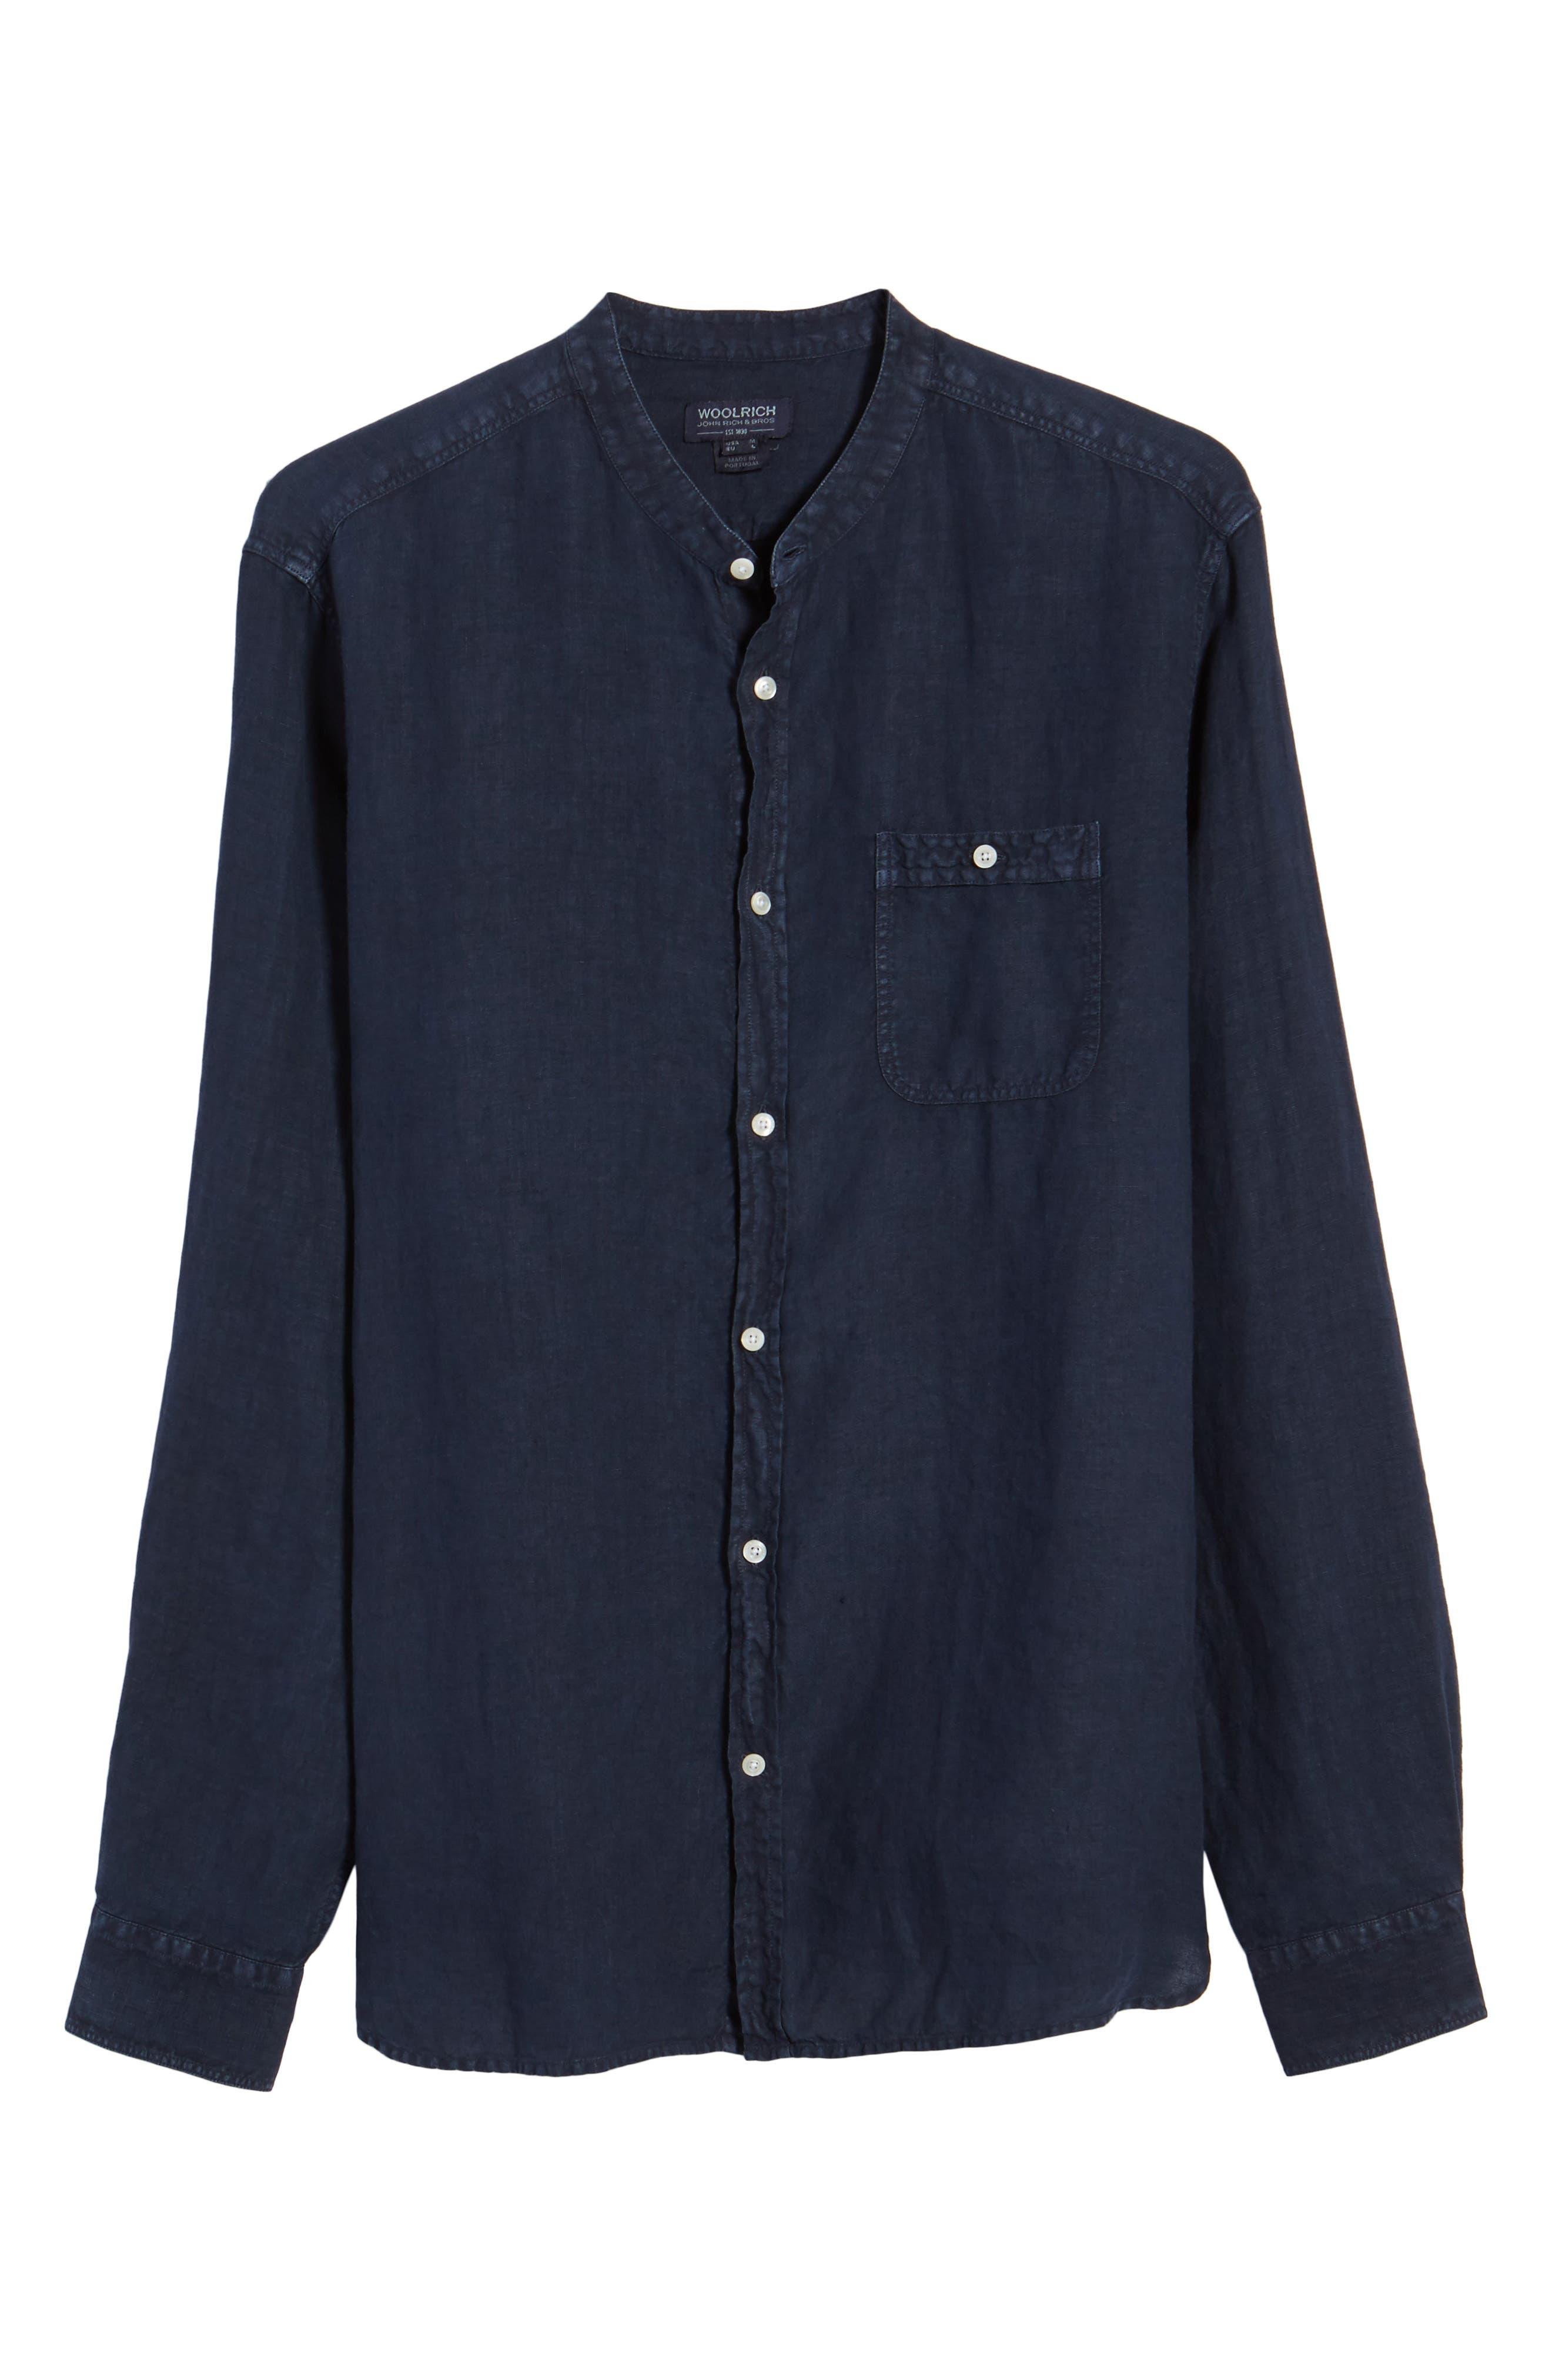 & Bros. Regular Fit Band Collar Linen Shirt,                             Alternate thumbnail 6, color,                             477